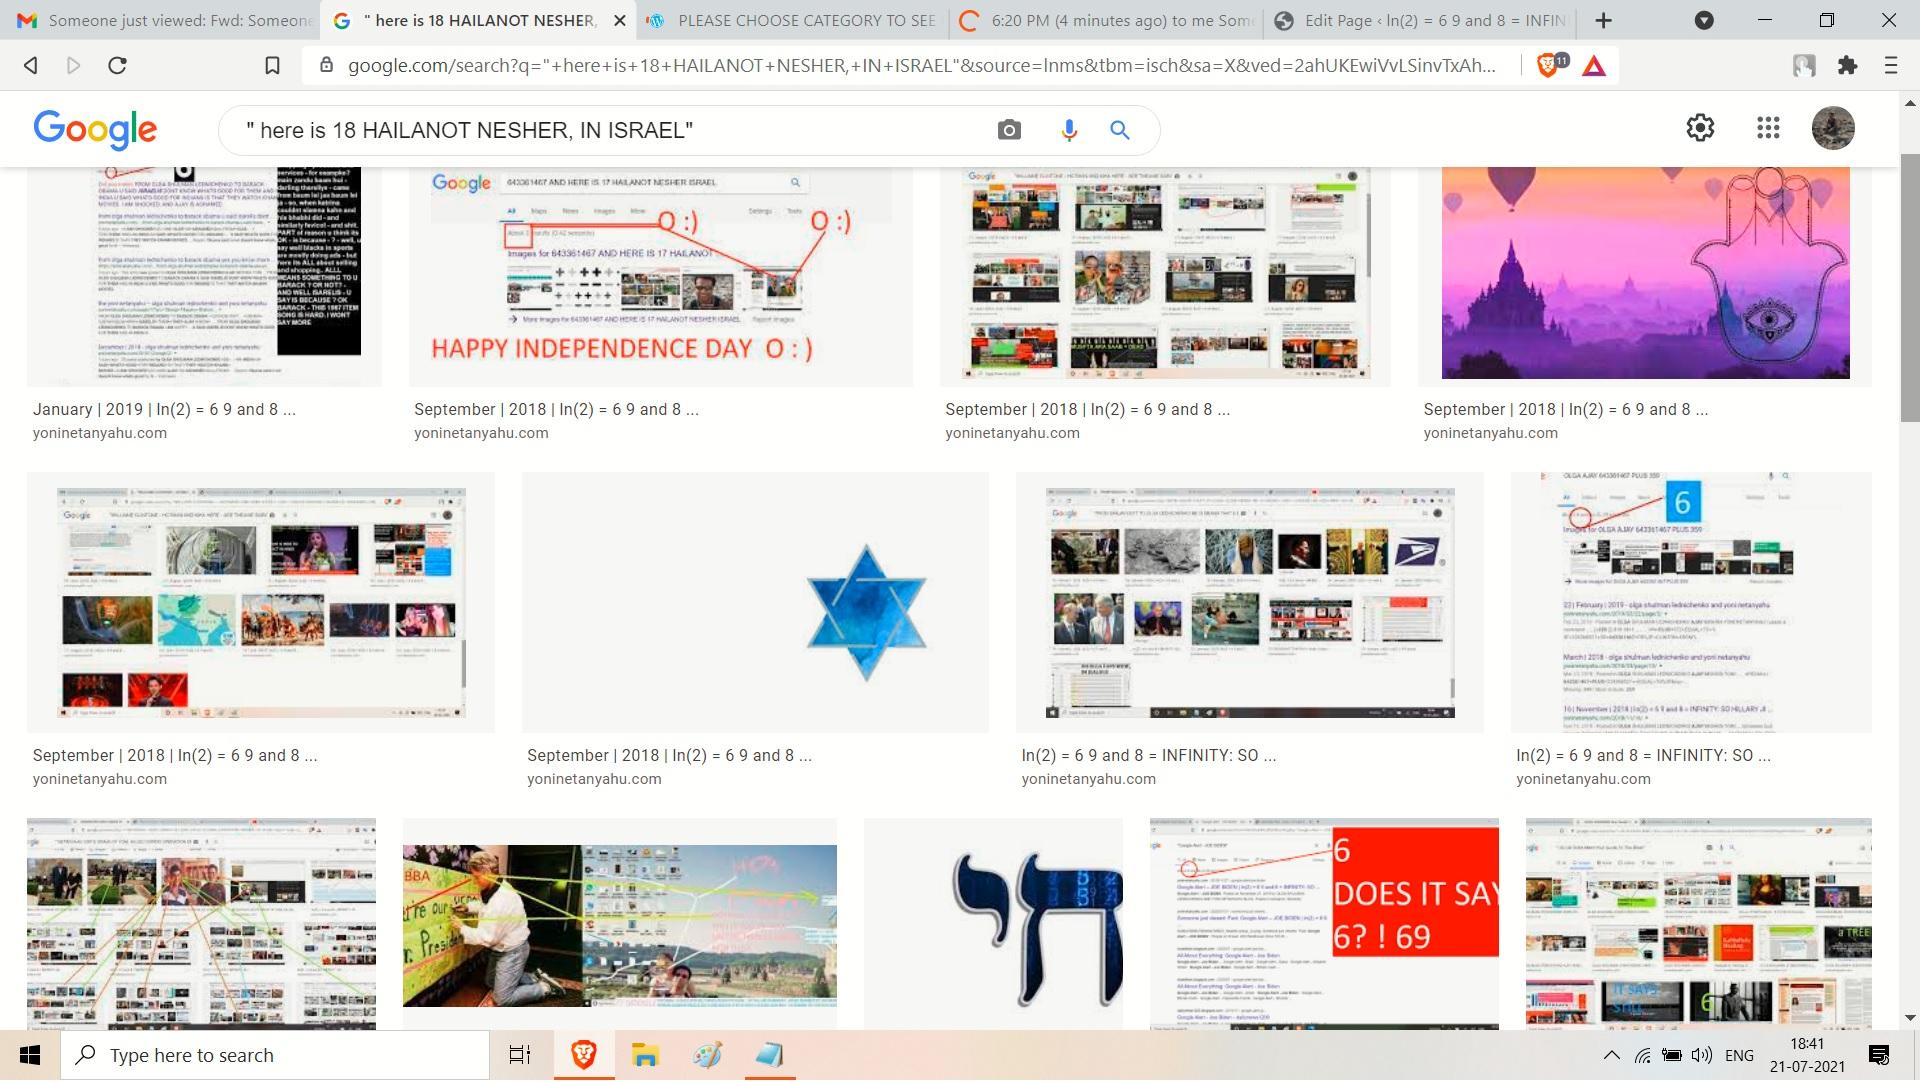 here is 18 HAILANOT NESHER, IN ISRAE